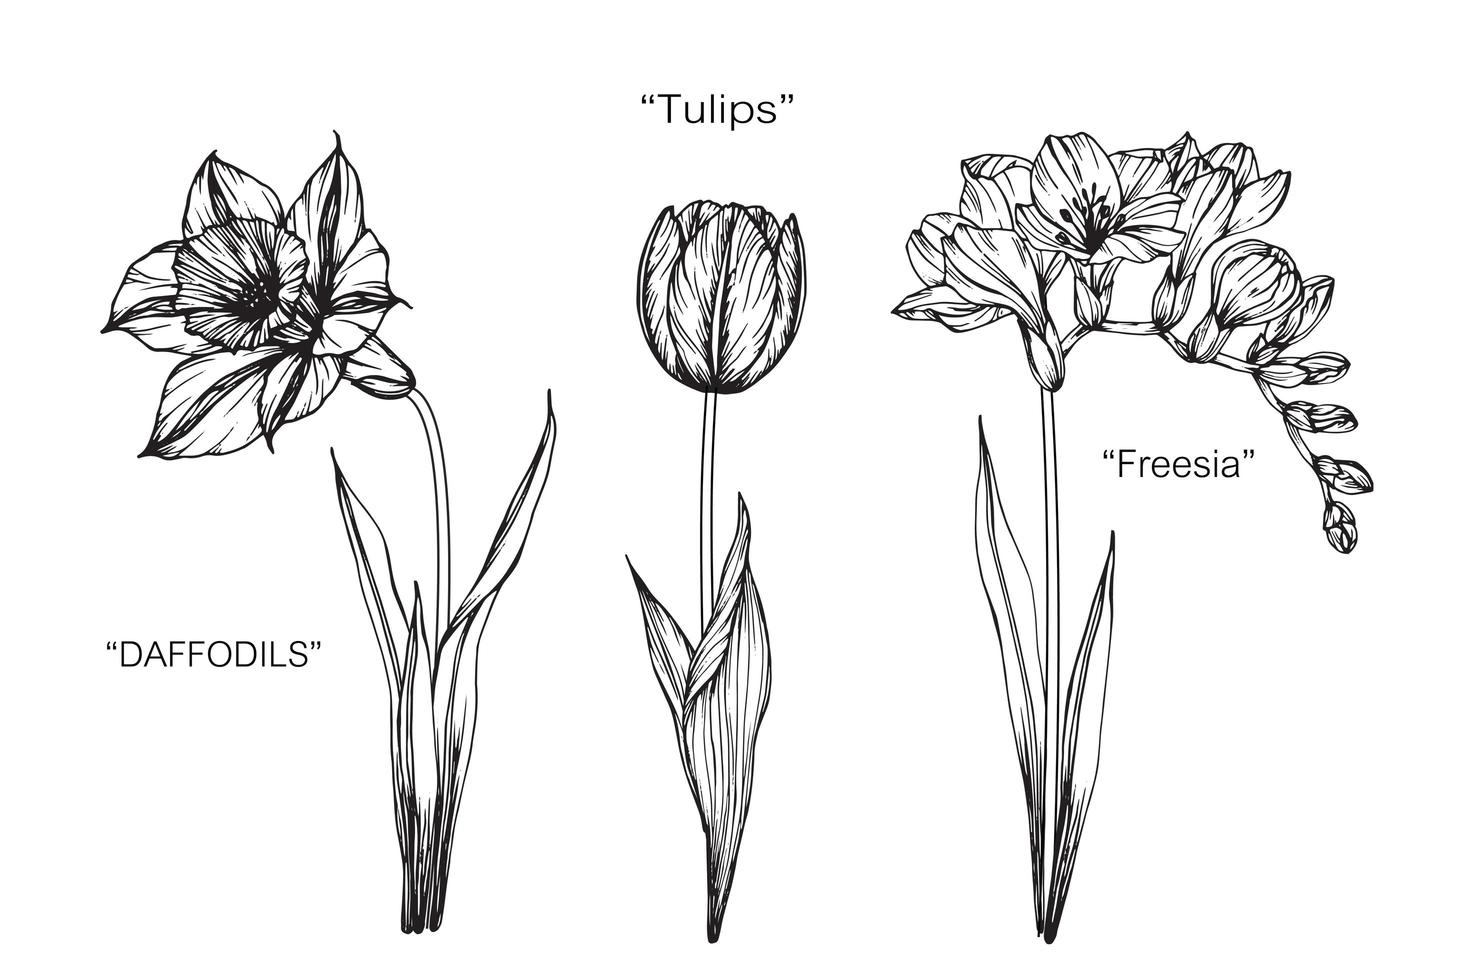 jonquilles, tulipe, fleur de freesia. vecteur